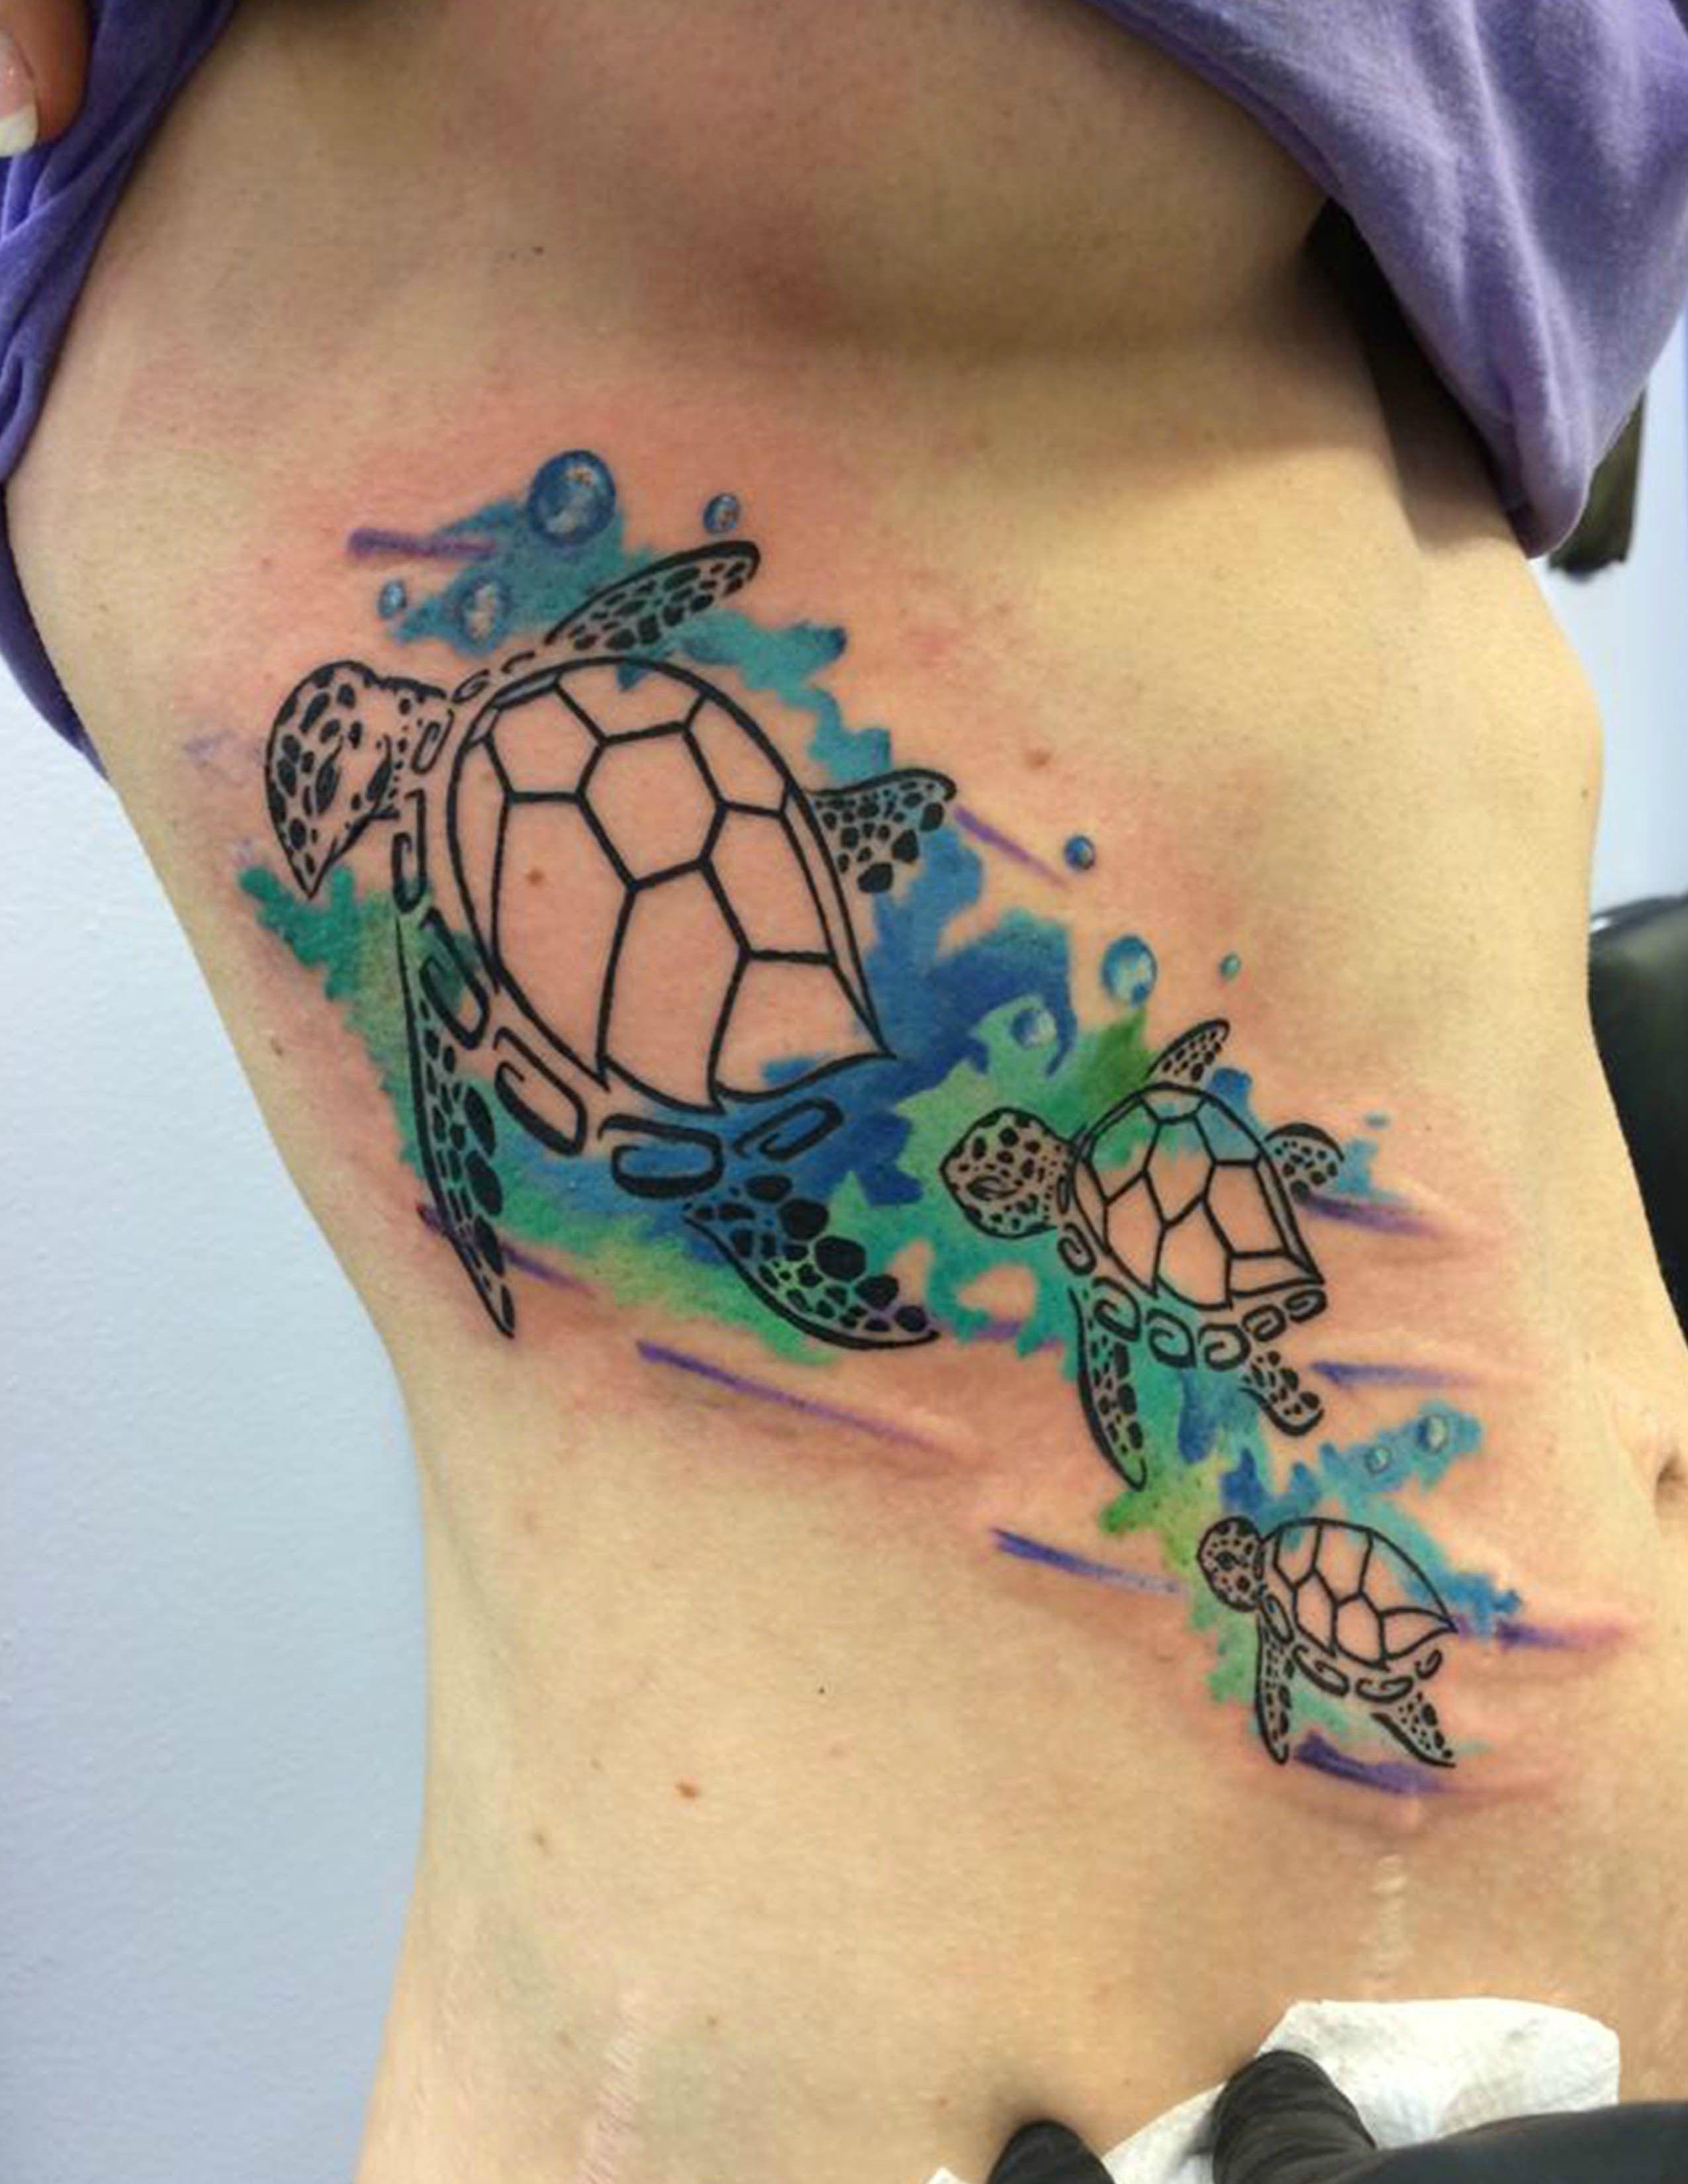 Watercolor Sea Turtles Tattoo By Chris Burke At Serenity Ink